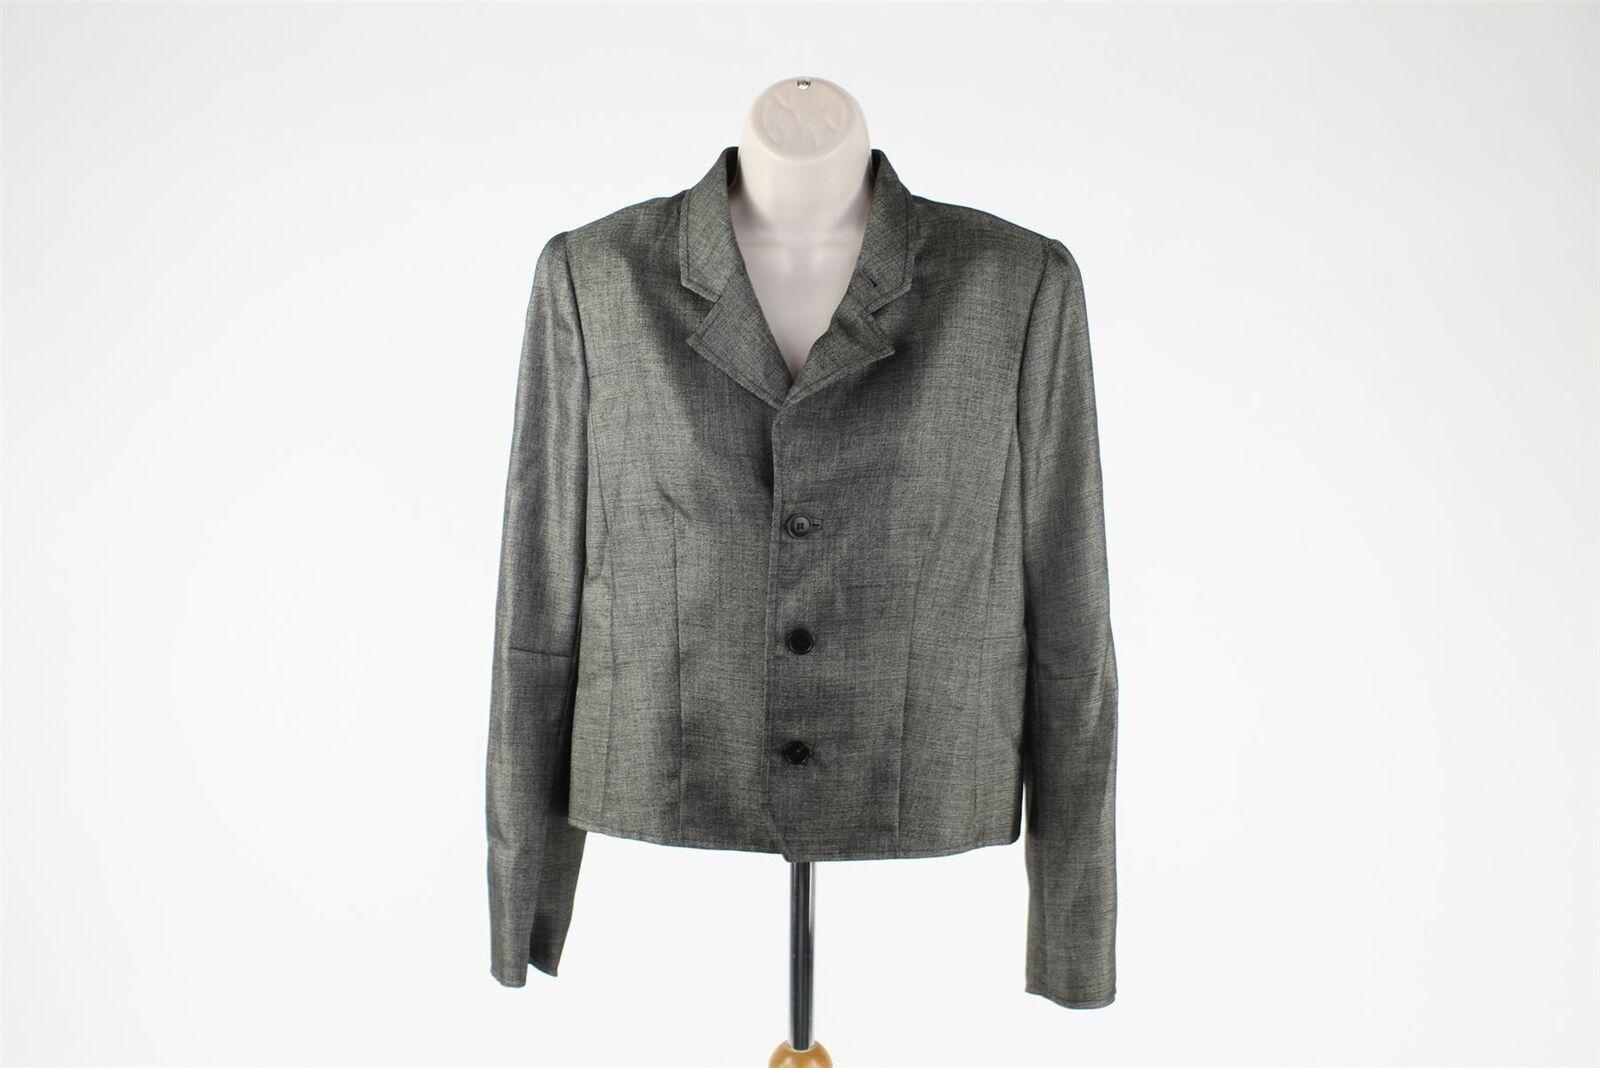 BALENCIAGA grau Wool Blend Blazer, UK 14 US 10 EU 42